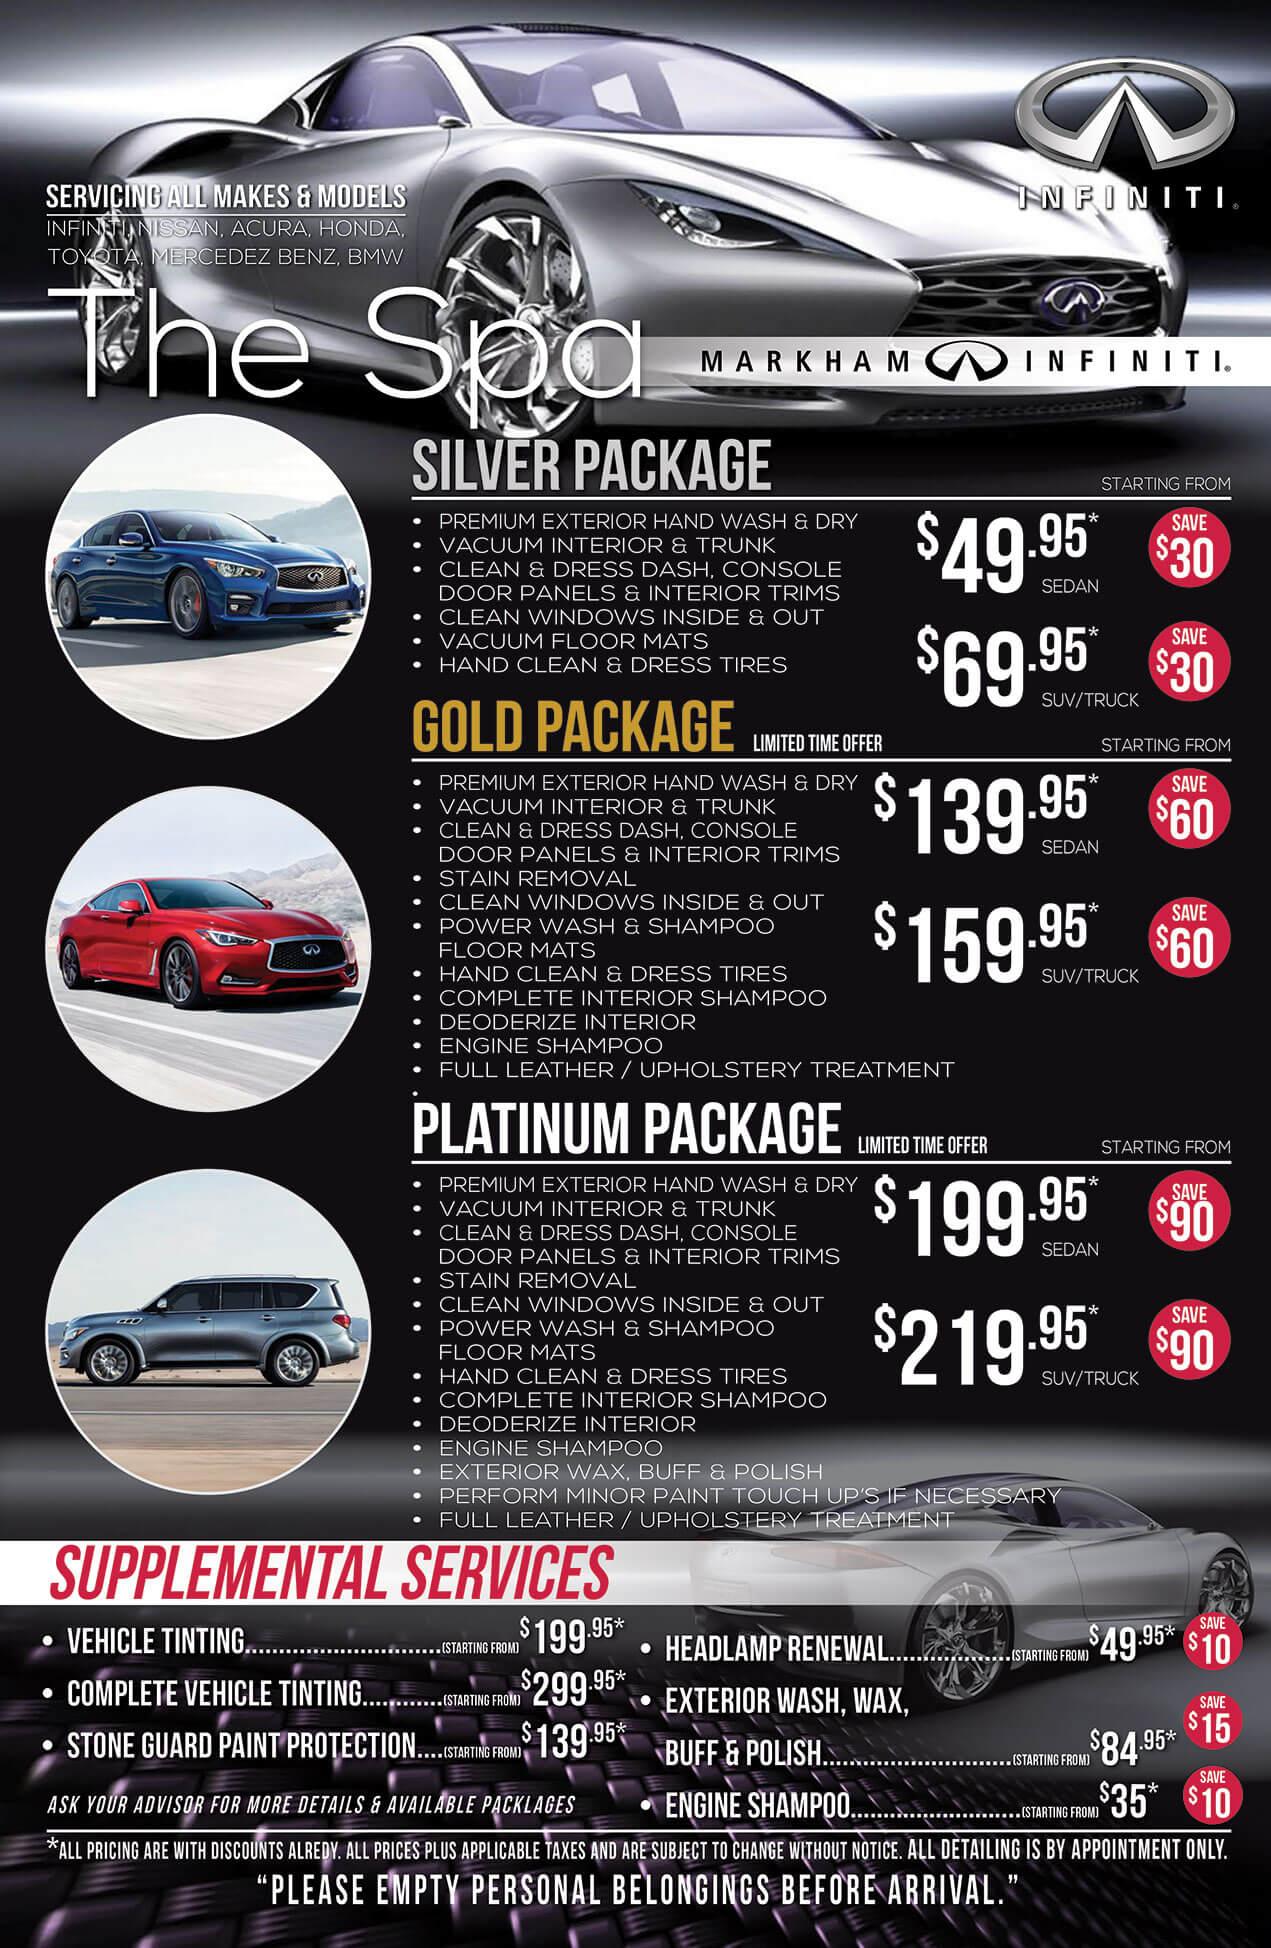 Car Amp SUV Detailing Packages Markham Infiniti